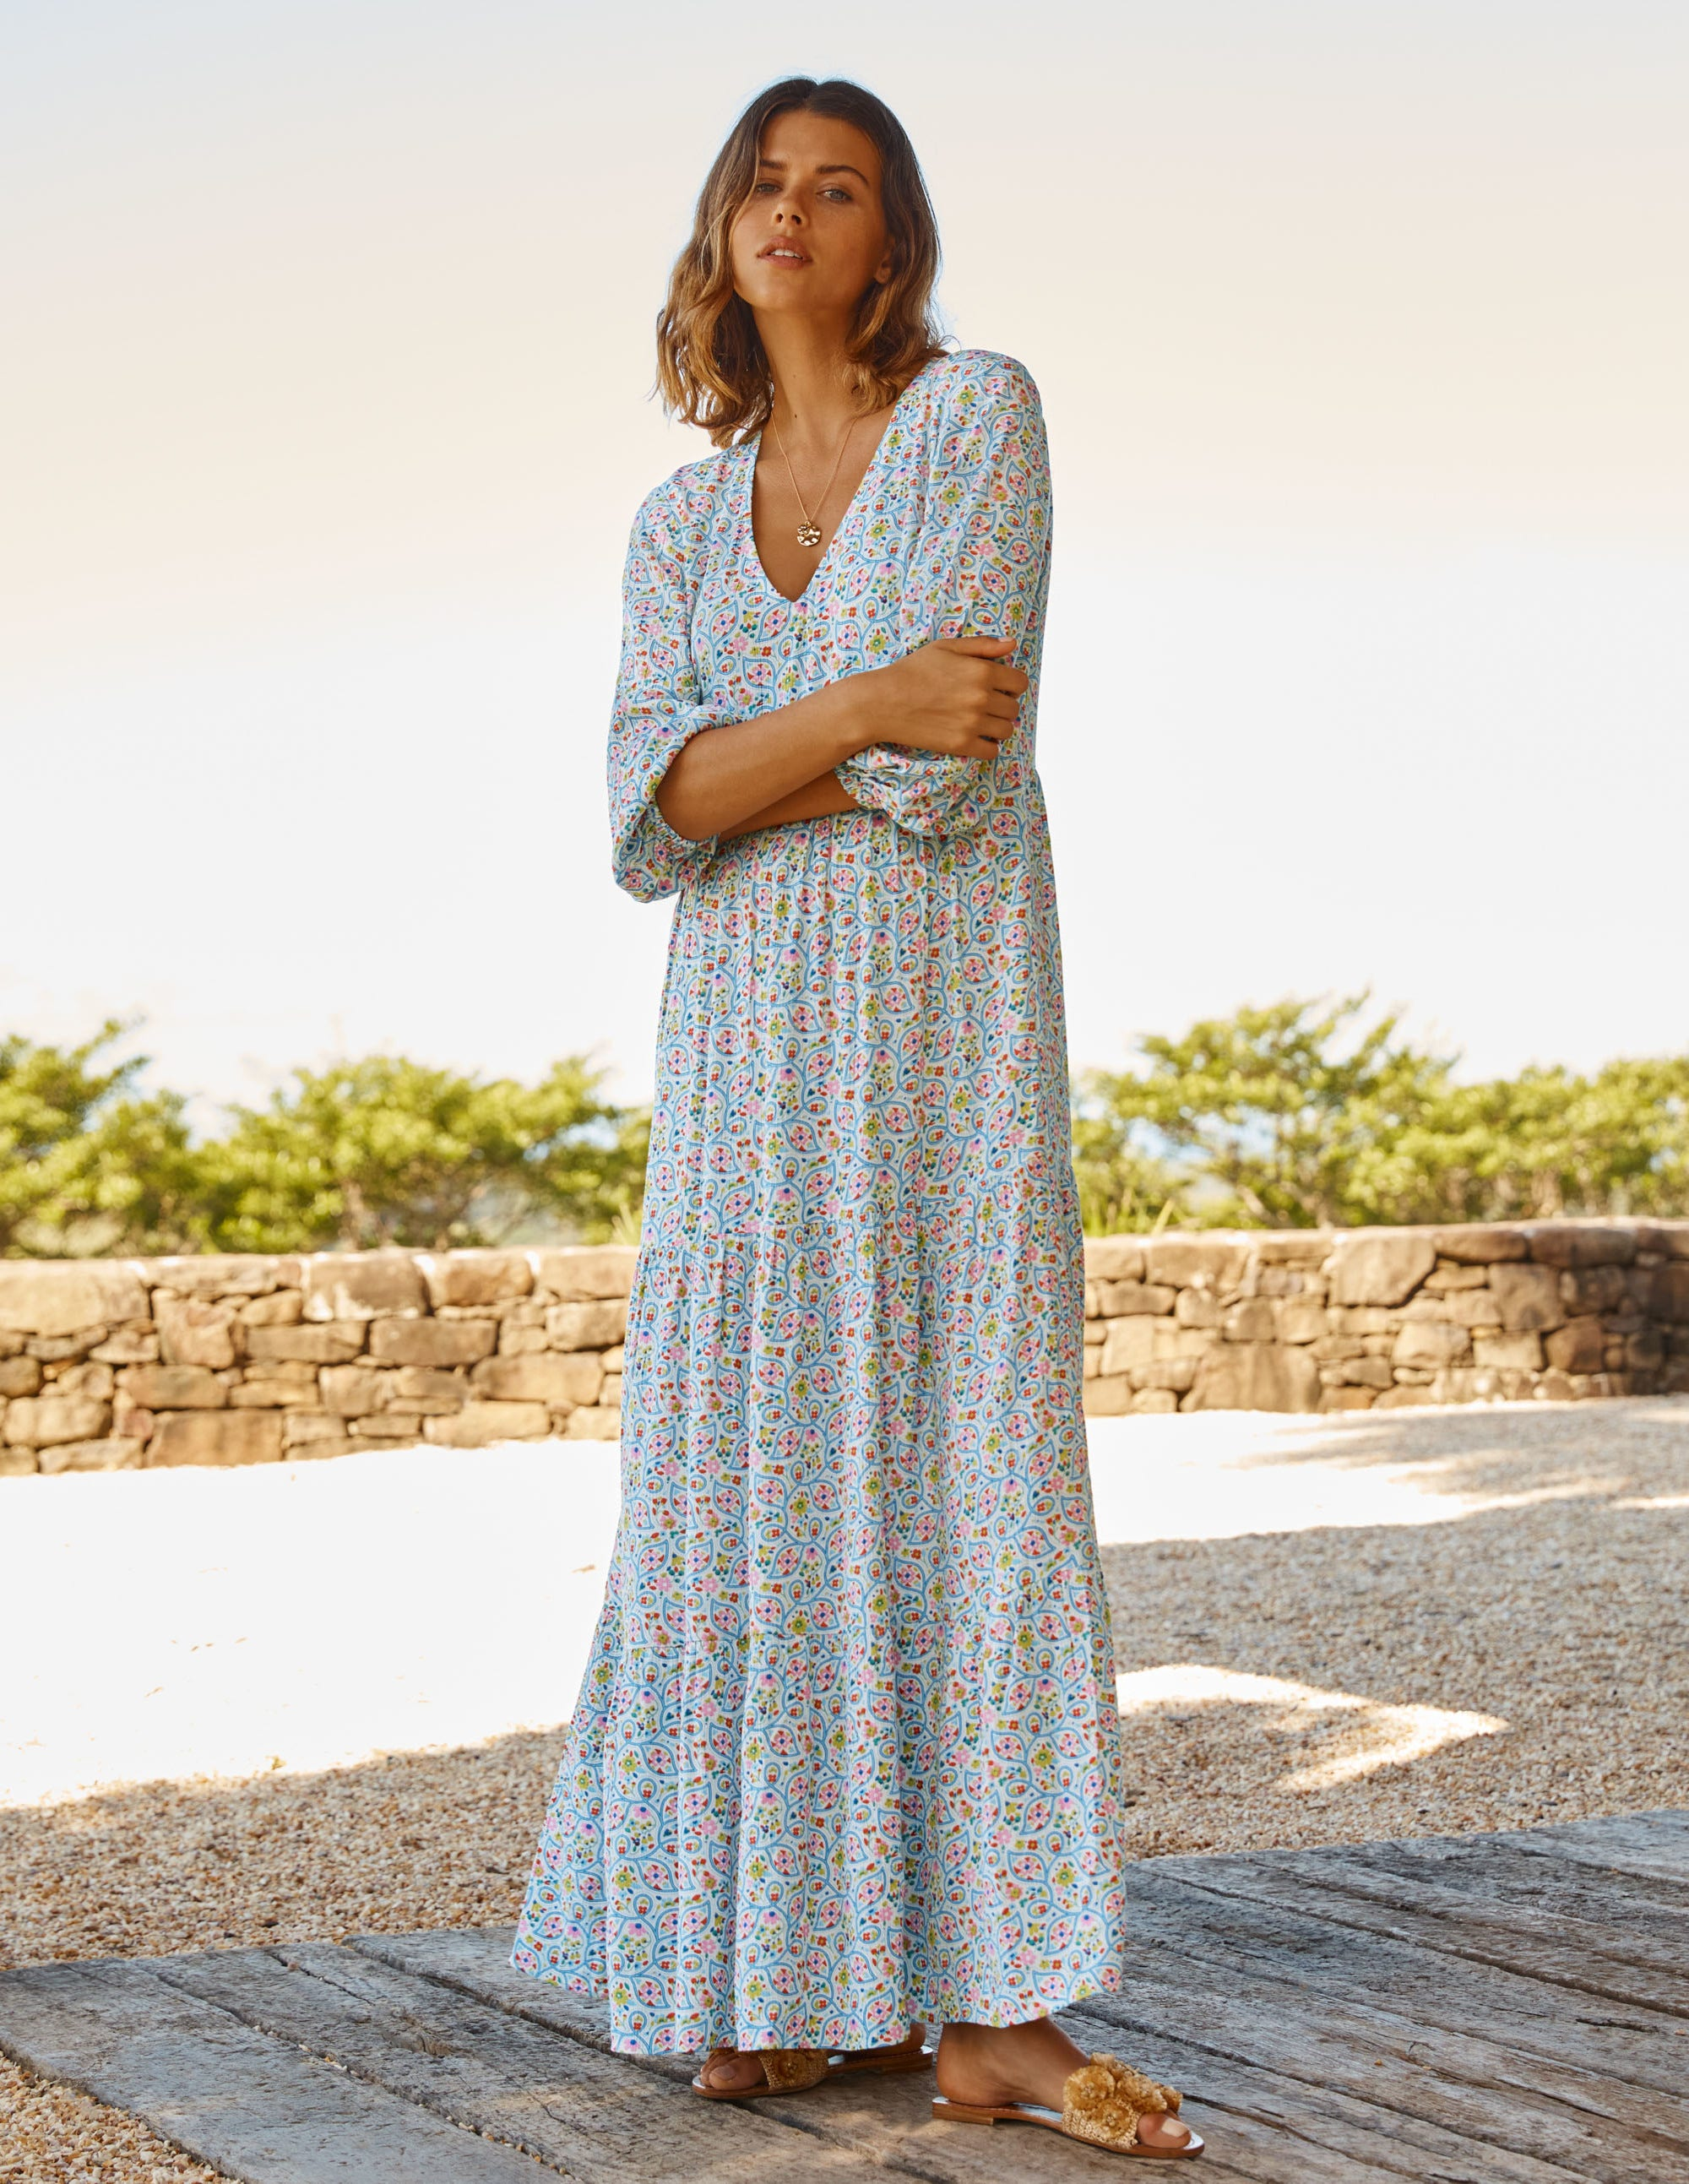 Boden Blouson Sleeve Maxi Dress - Ivory, Leafy Floral